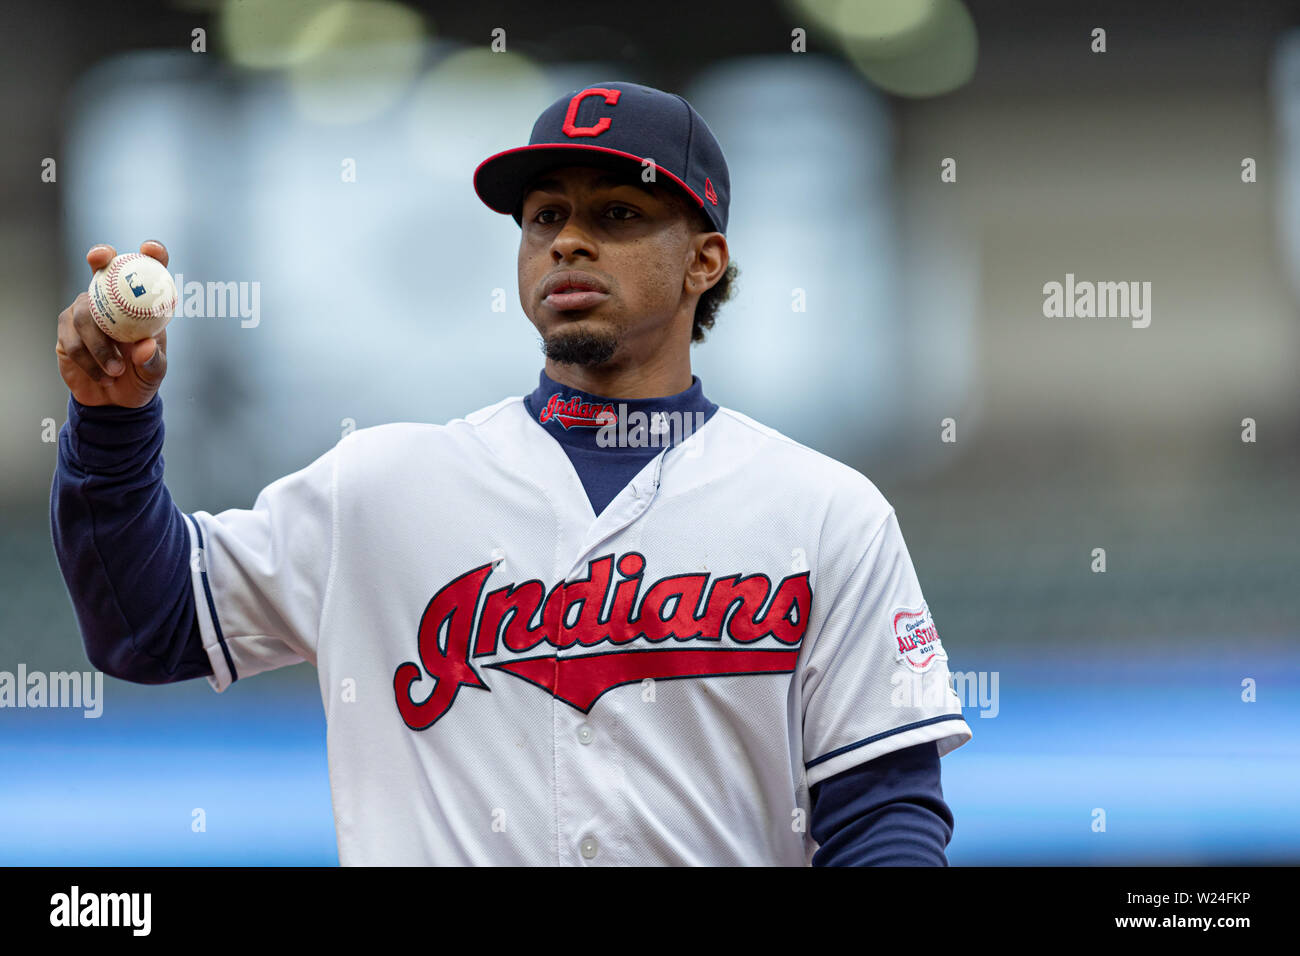 May 16th, 2019: Cleveland Indians shortstop Francisco Lindor